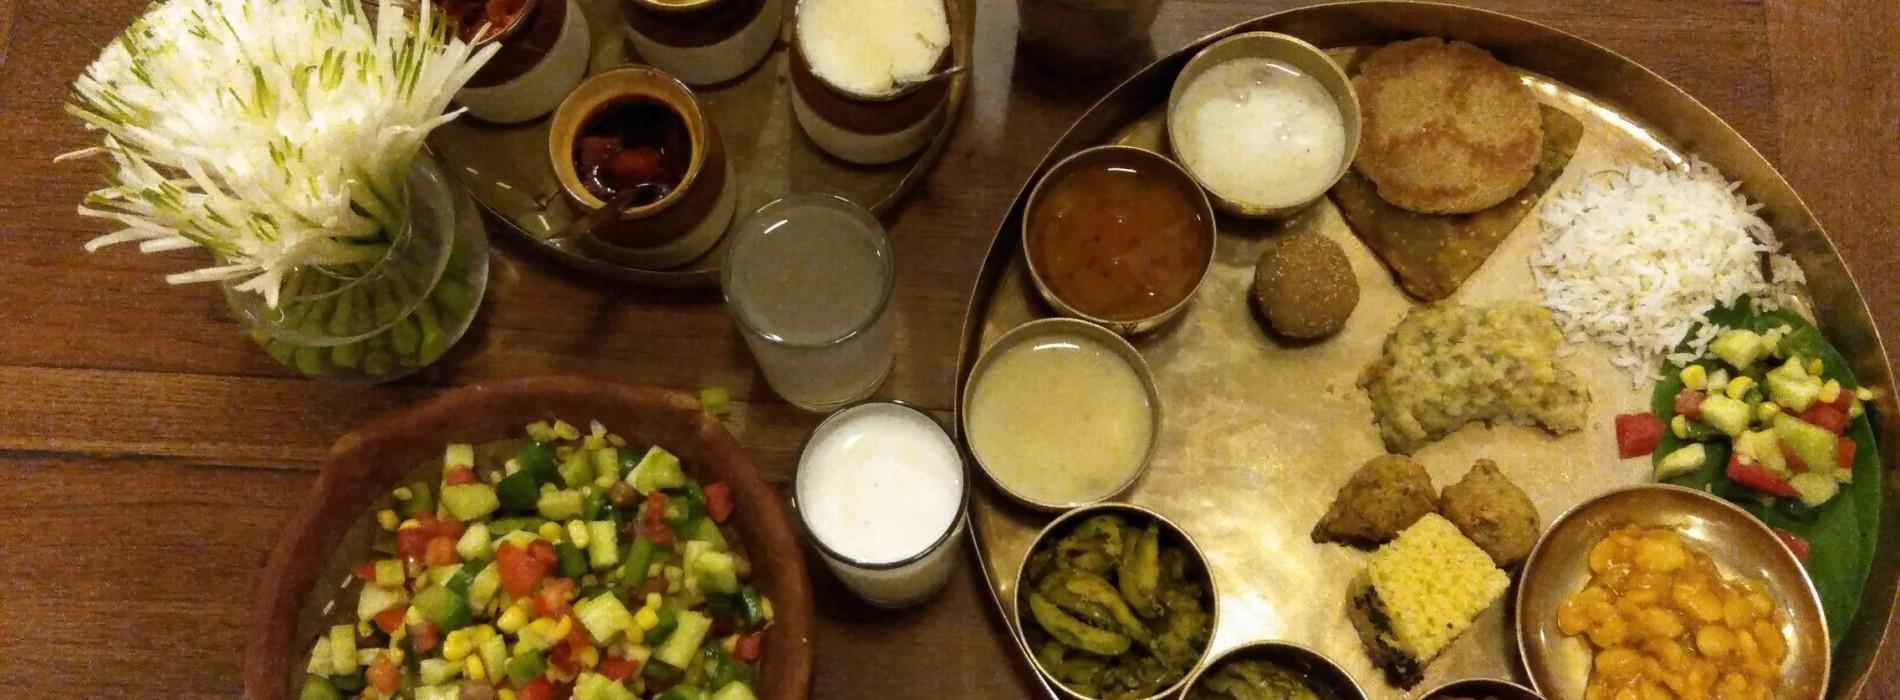 Food options during coronavirus lockdown